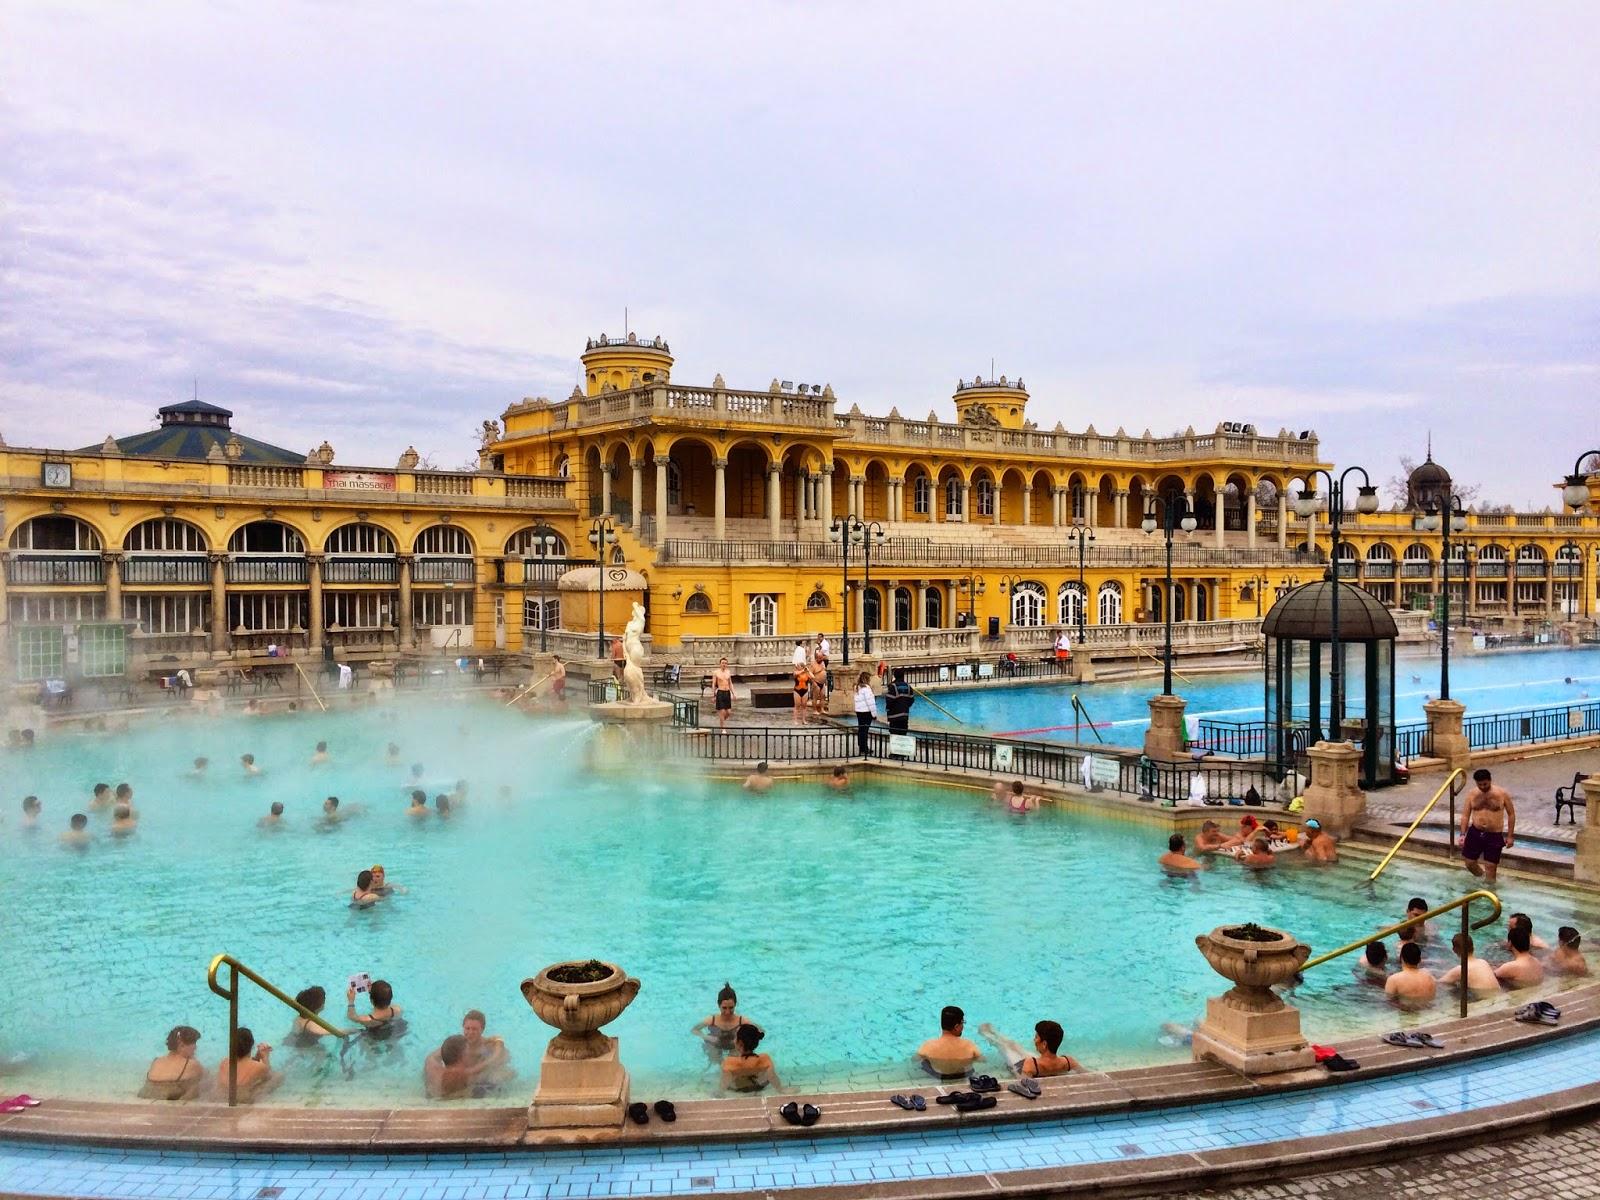 Széchenyi Thermal Spa Baths - Budapest